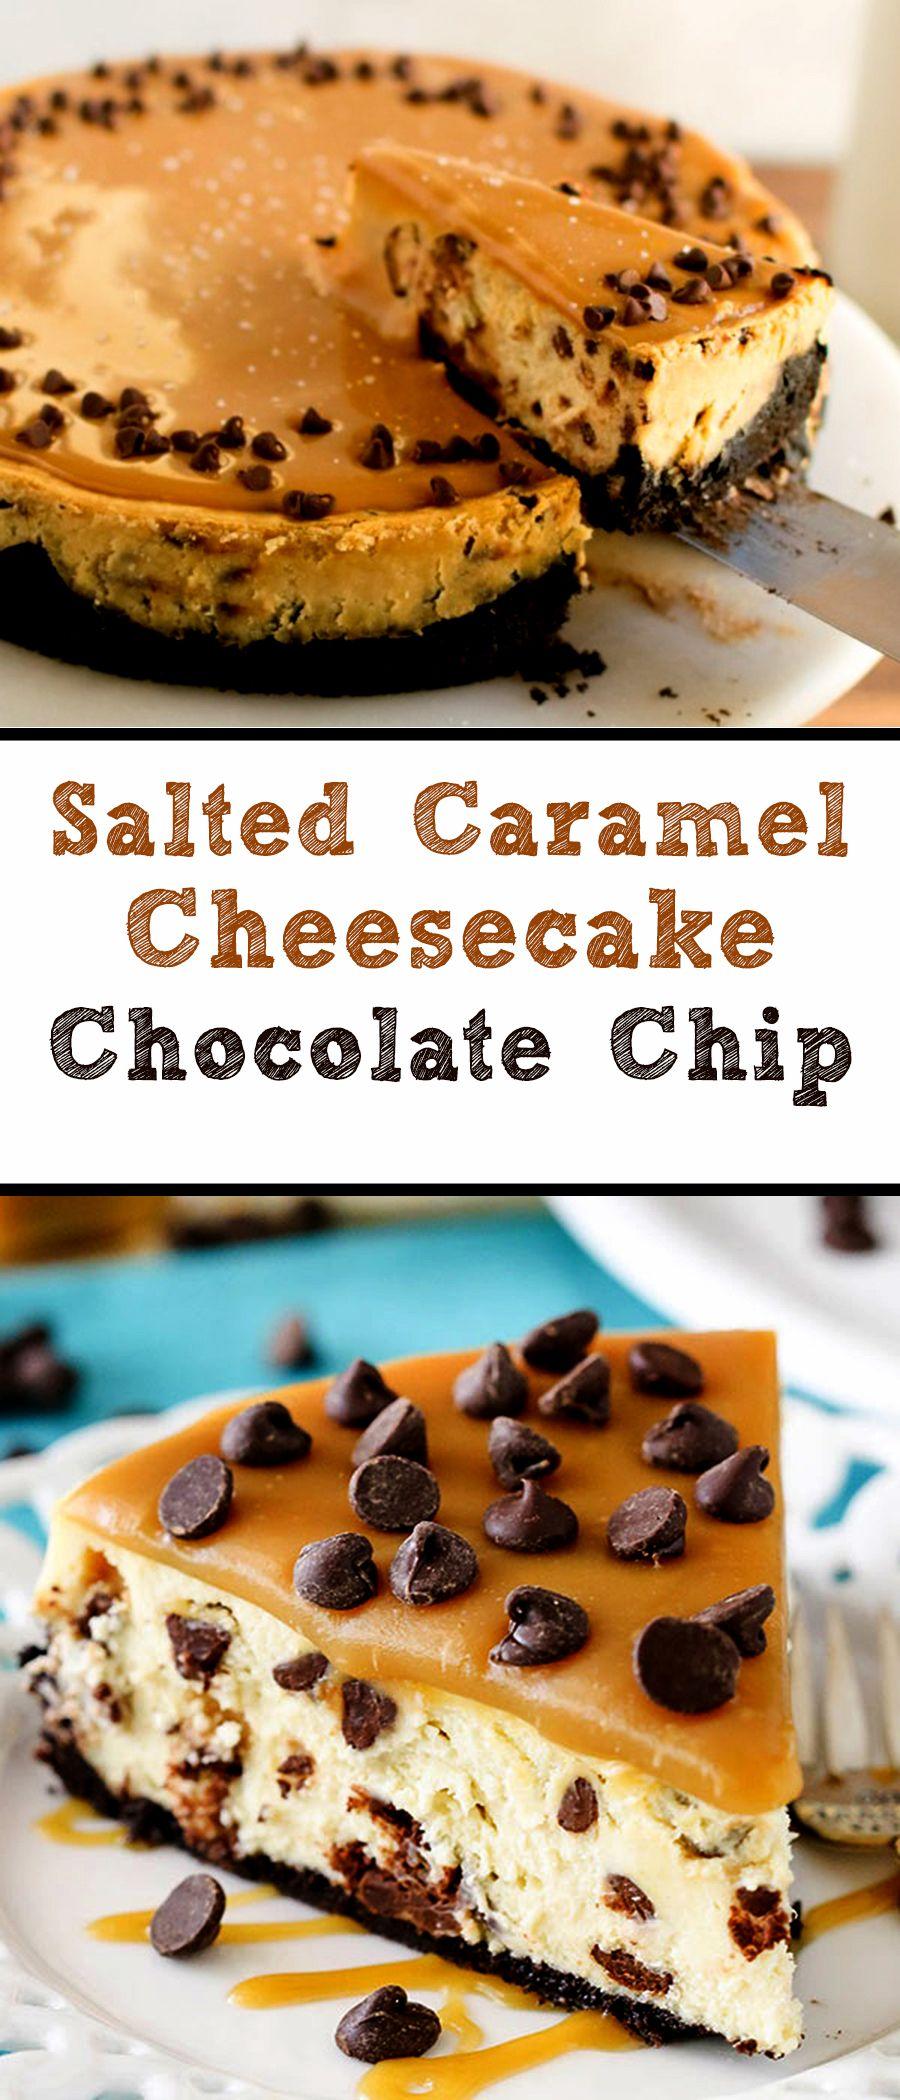 Salted caramel cheesecake chocolate chip cake recipes